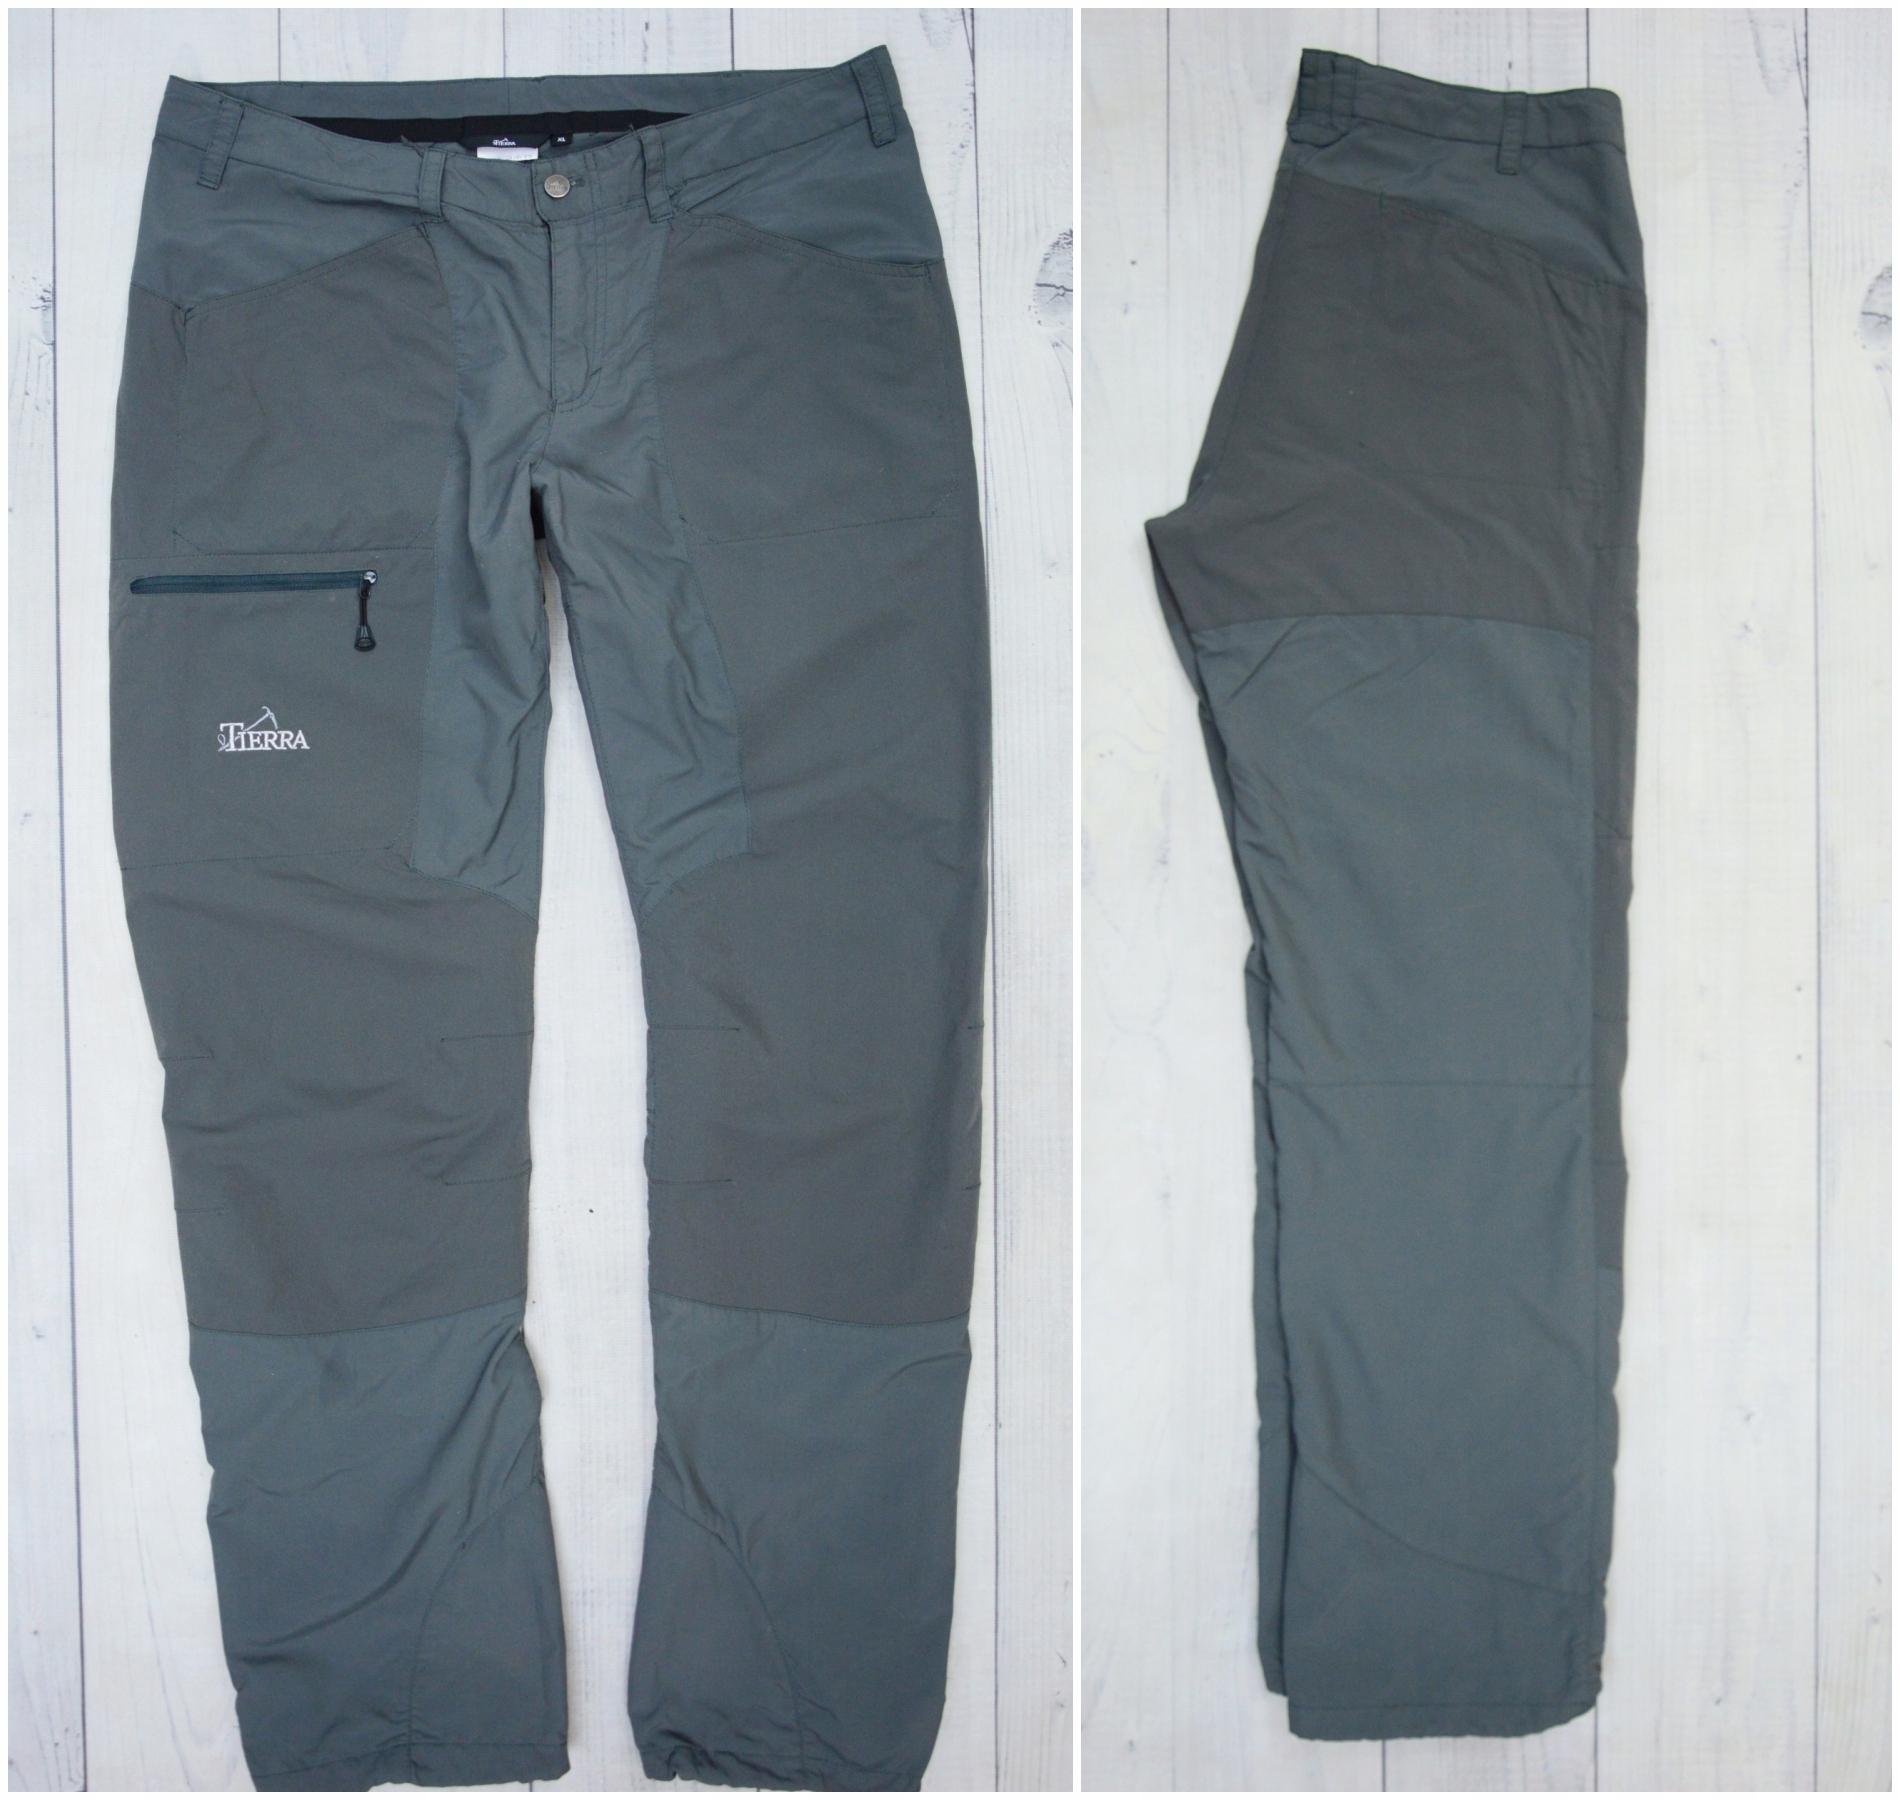 SPODNIE ADIDAS RESPONSE WIND PANTS B47707 r XXL